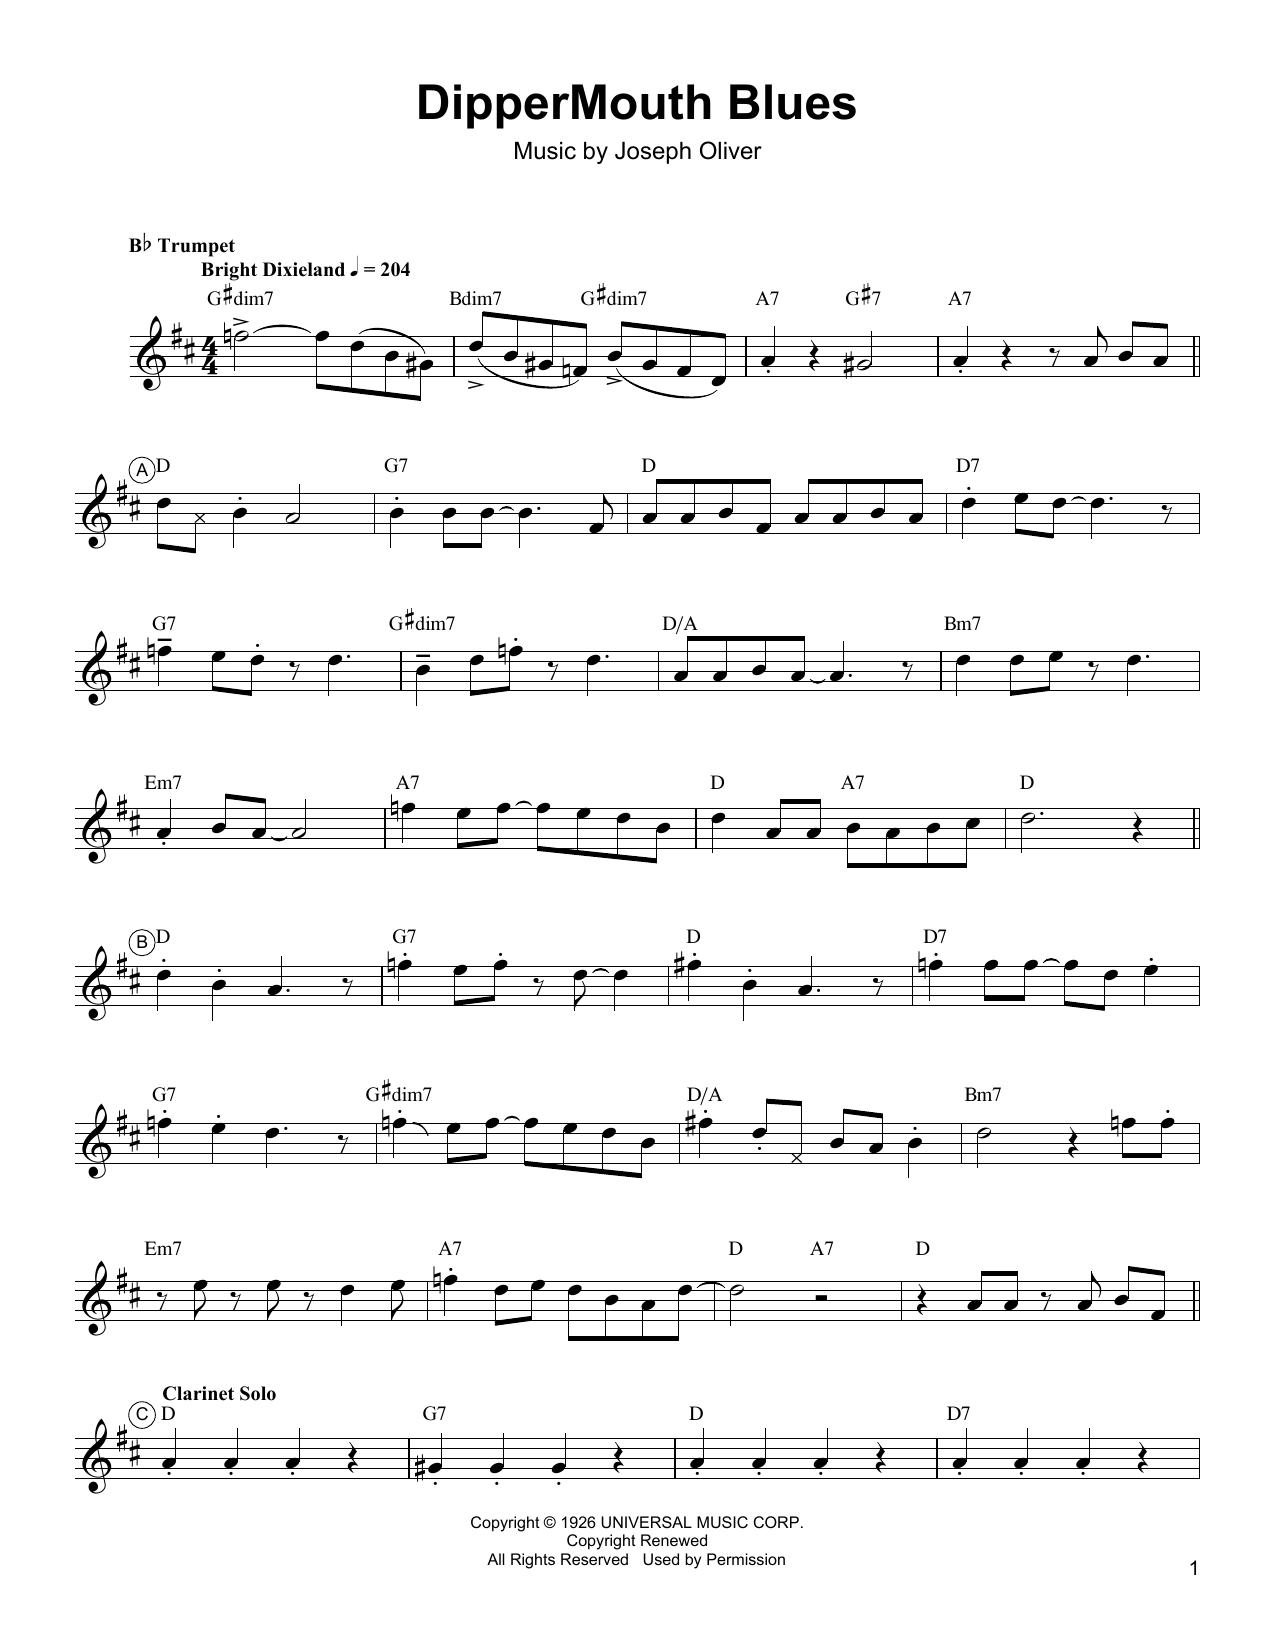 Dippermouth Blues Sheet Music